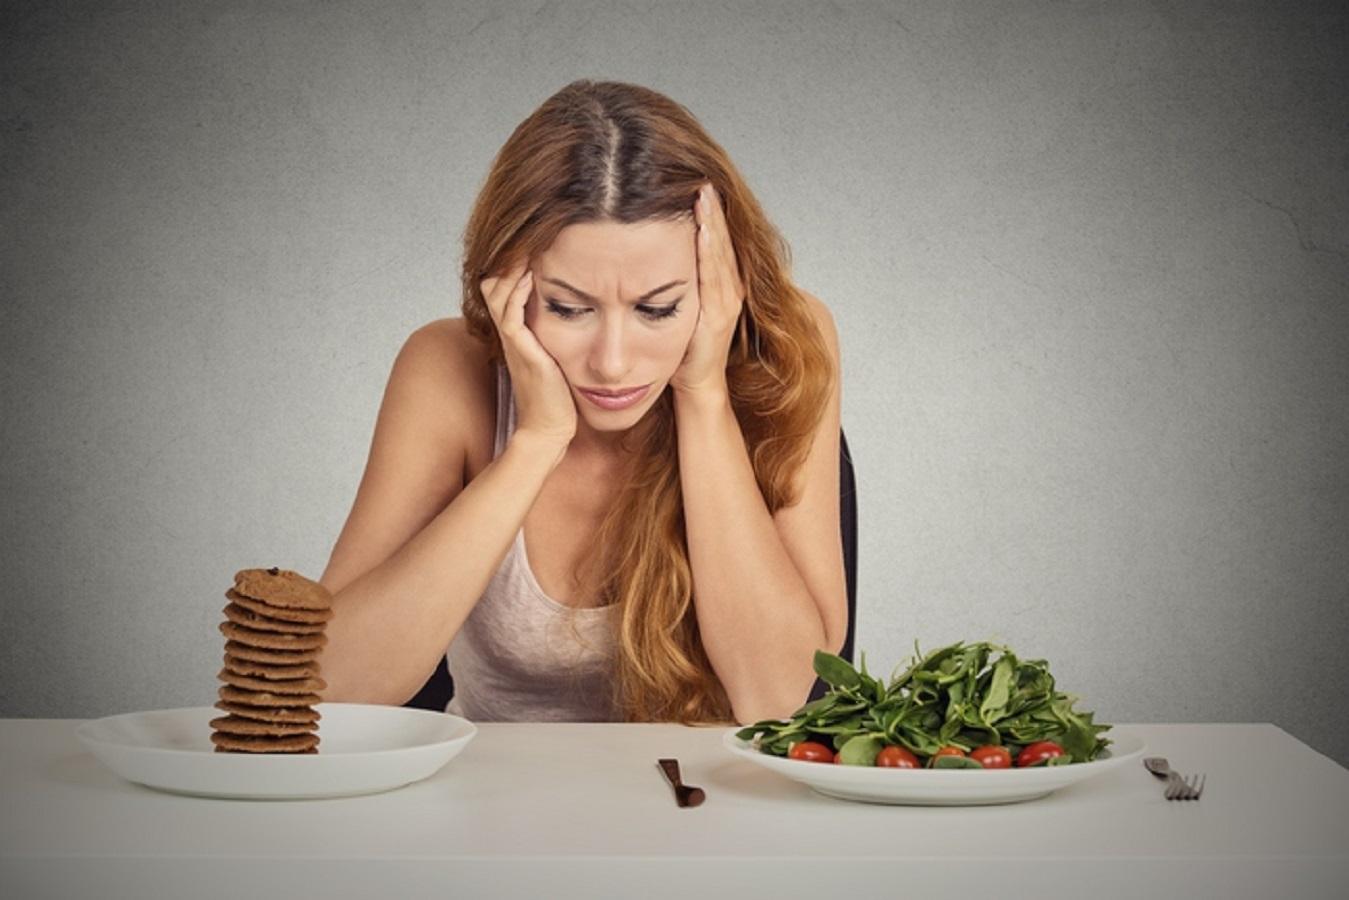 dimagrire-dieta-senza-carboidrati